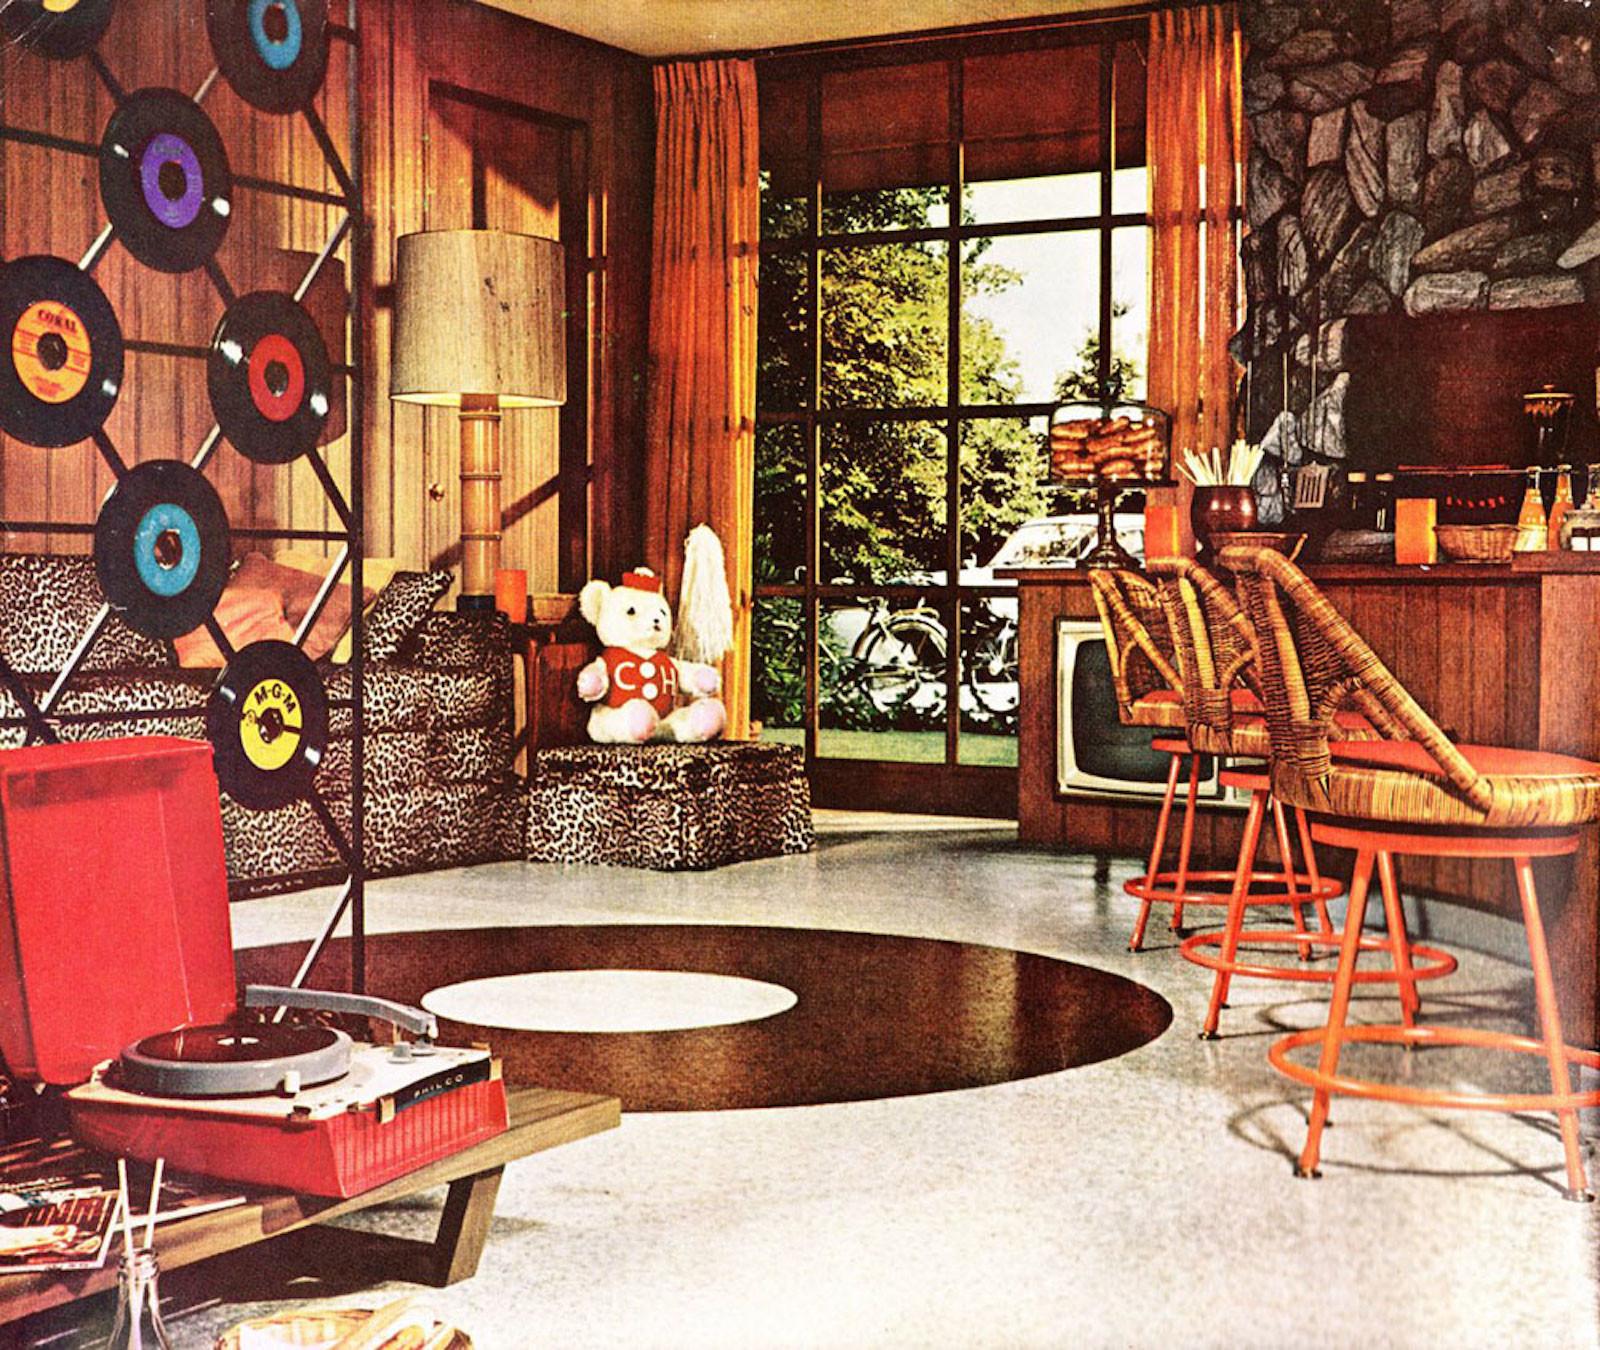 ретро дизайн комнаты картинки удобства